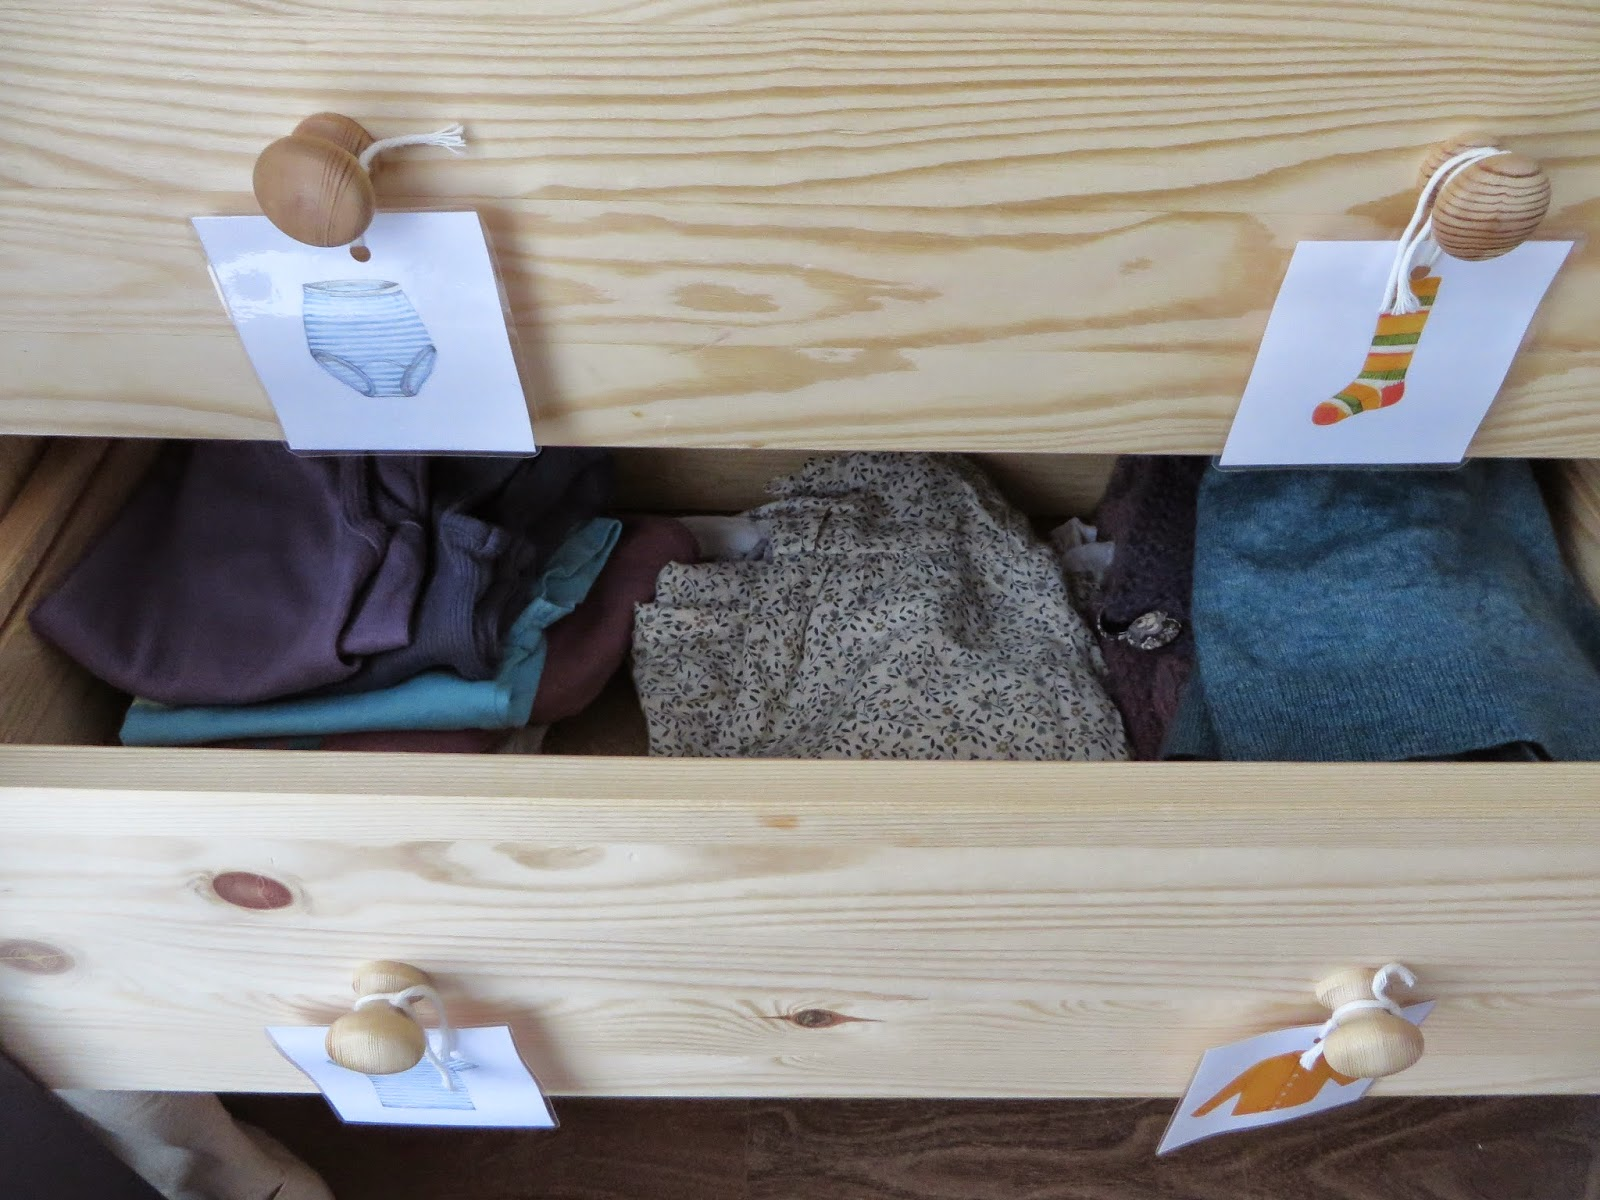 apo leo inspiration montessori ranger les v tements des filles. Black Bedroom Furniture Sets. Home Design Ideas